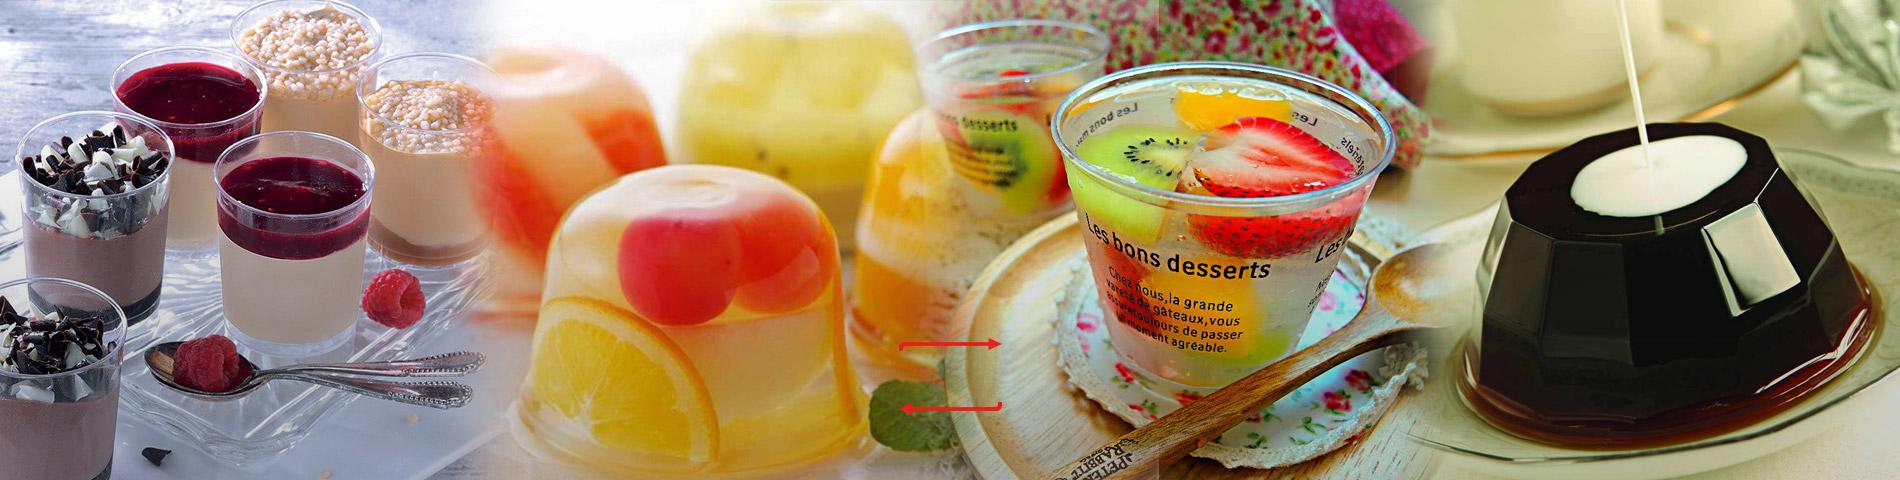 Plastic Pudding Dessert Cup